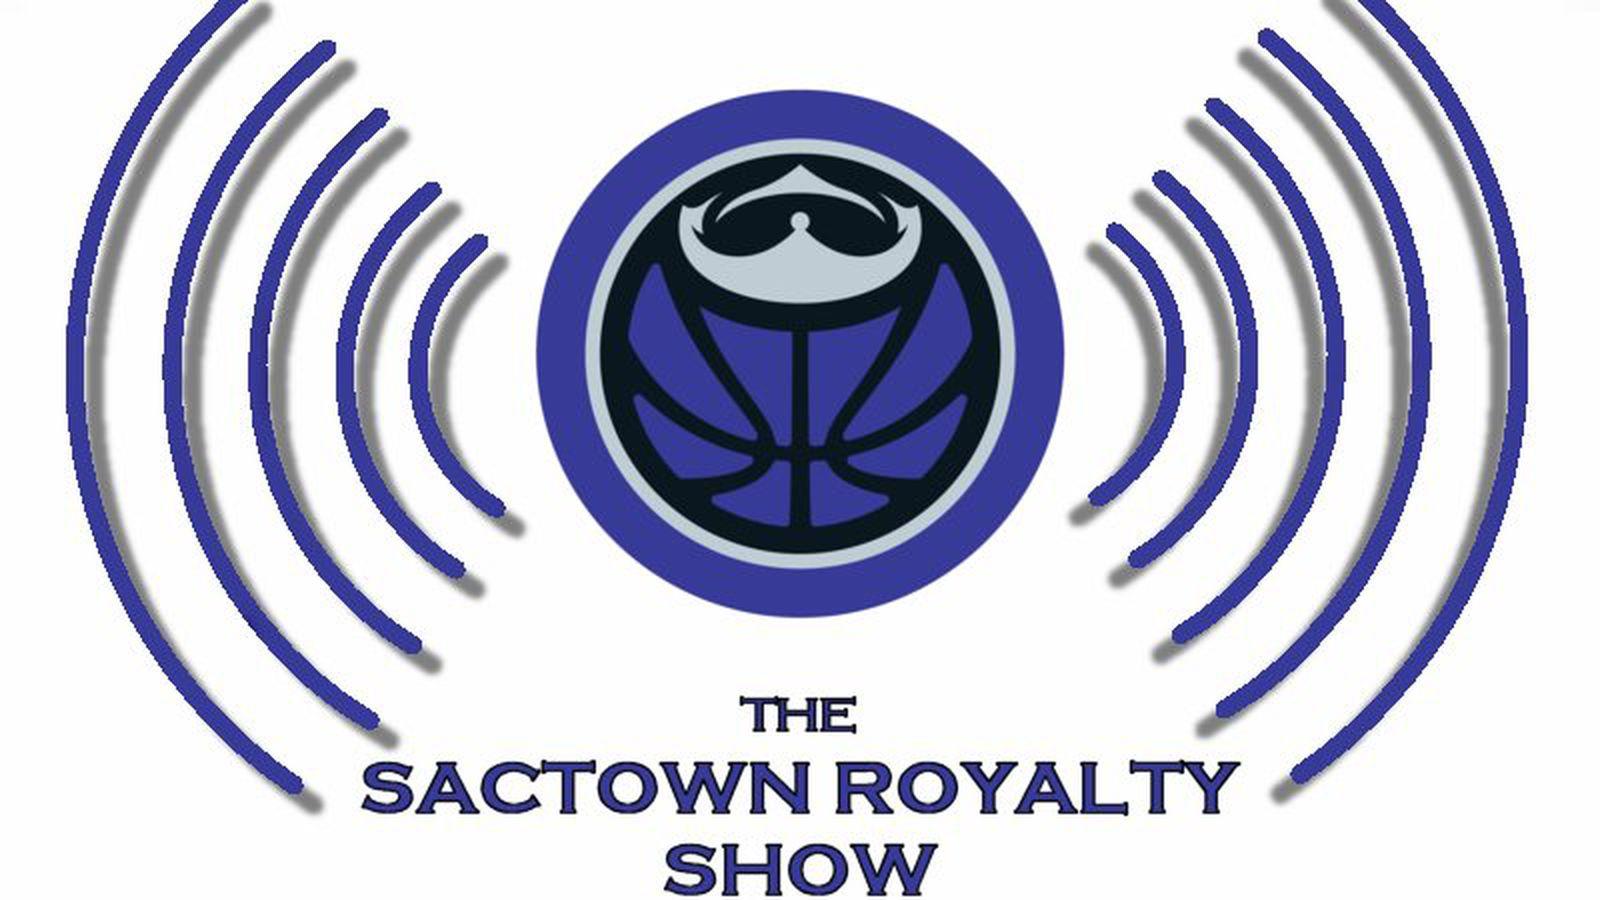 Sactown_royalty_show_logo.0